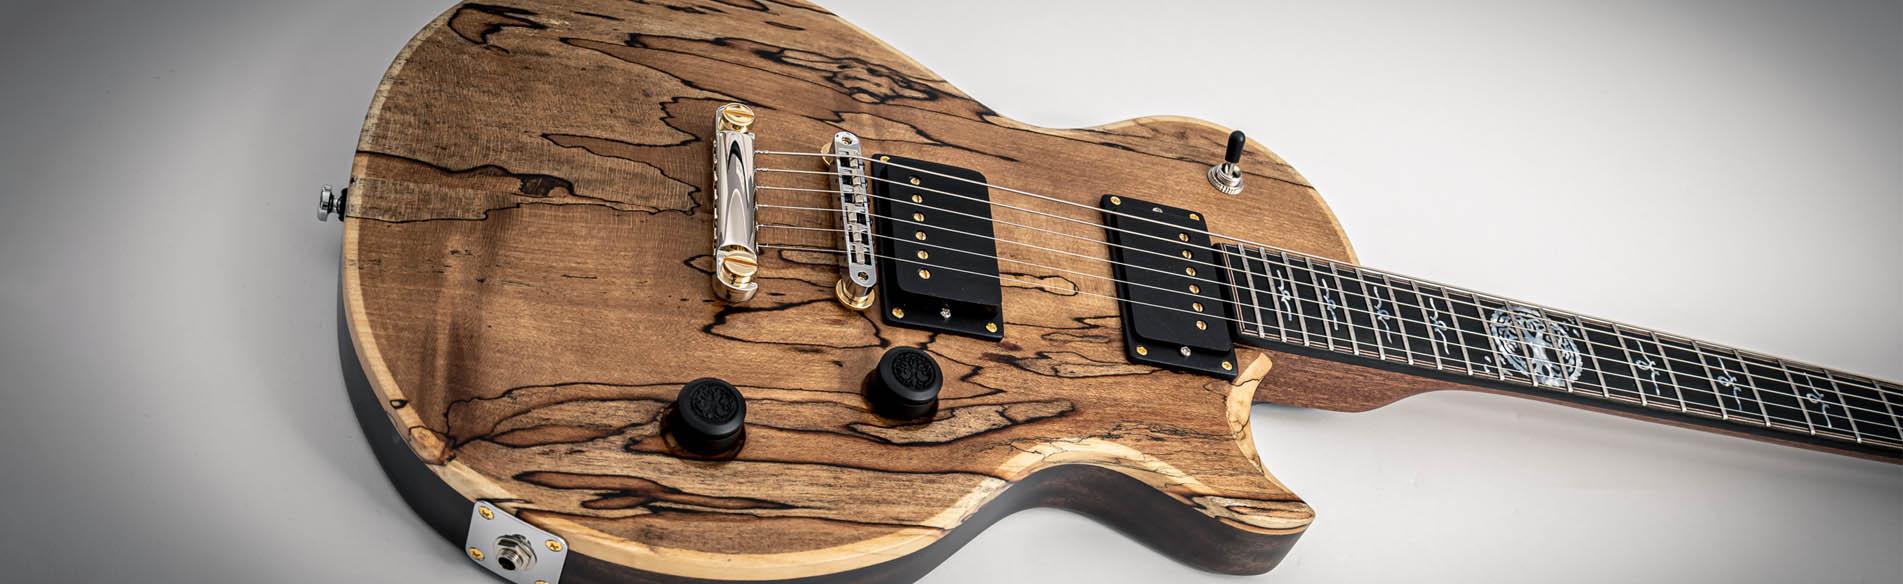 Mithans-Guitars-1627071605.jpg